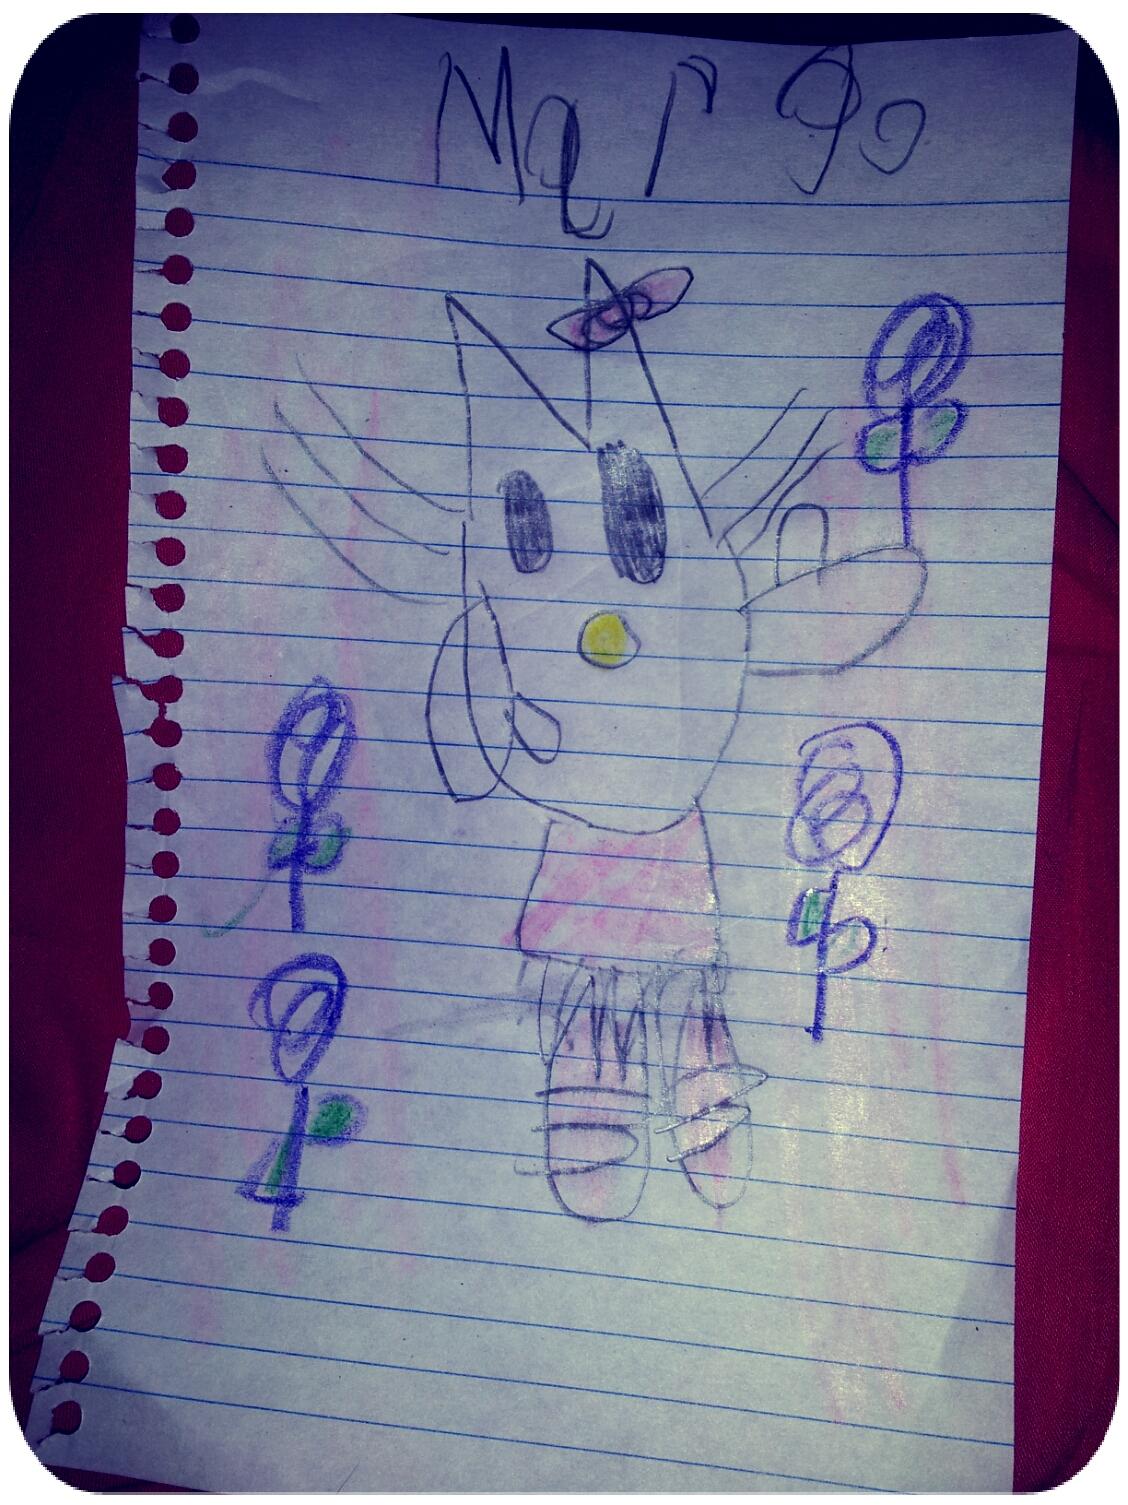 2012-04-09 21.23.17_Josh_Round.jpg